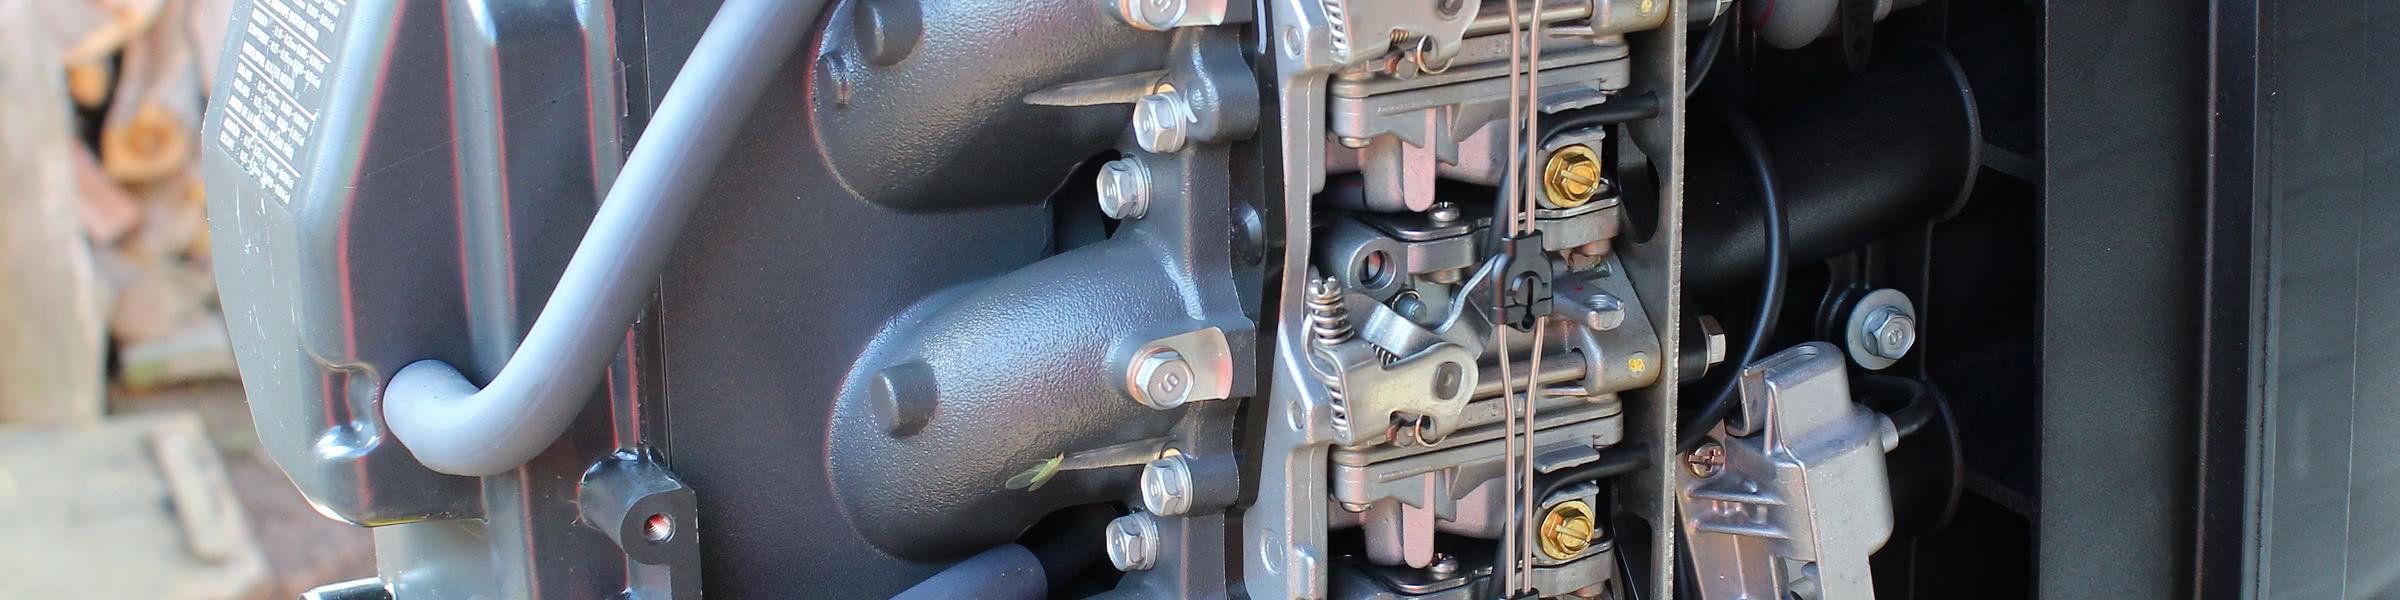 Motors, Technology